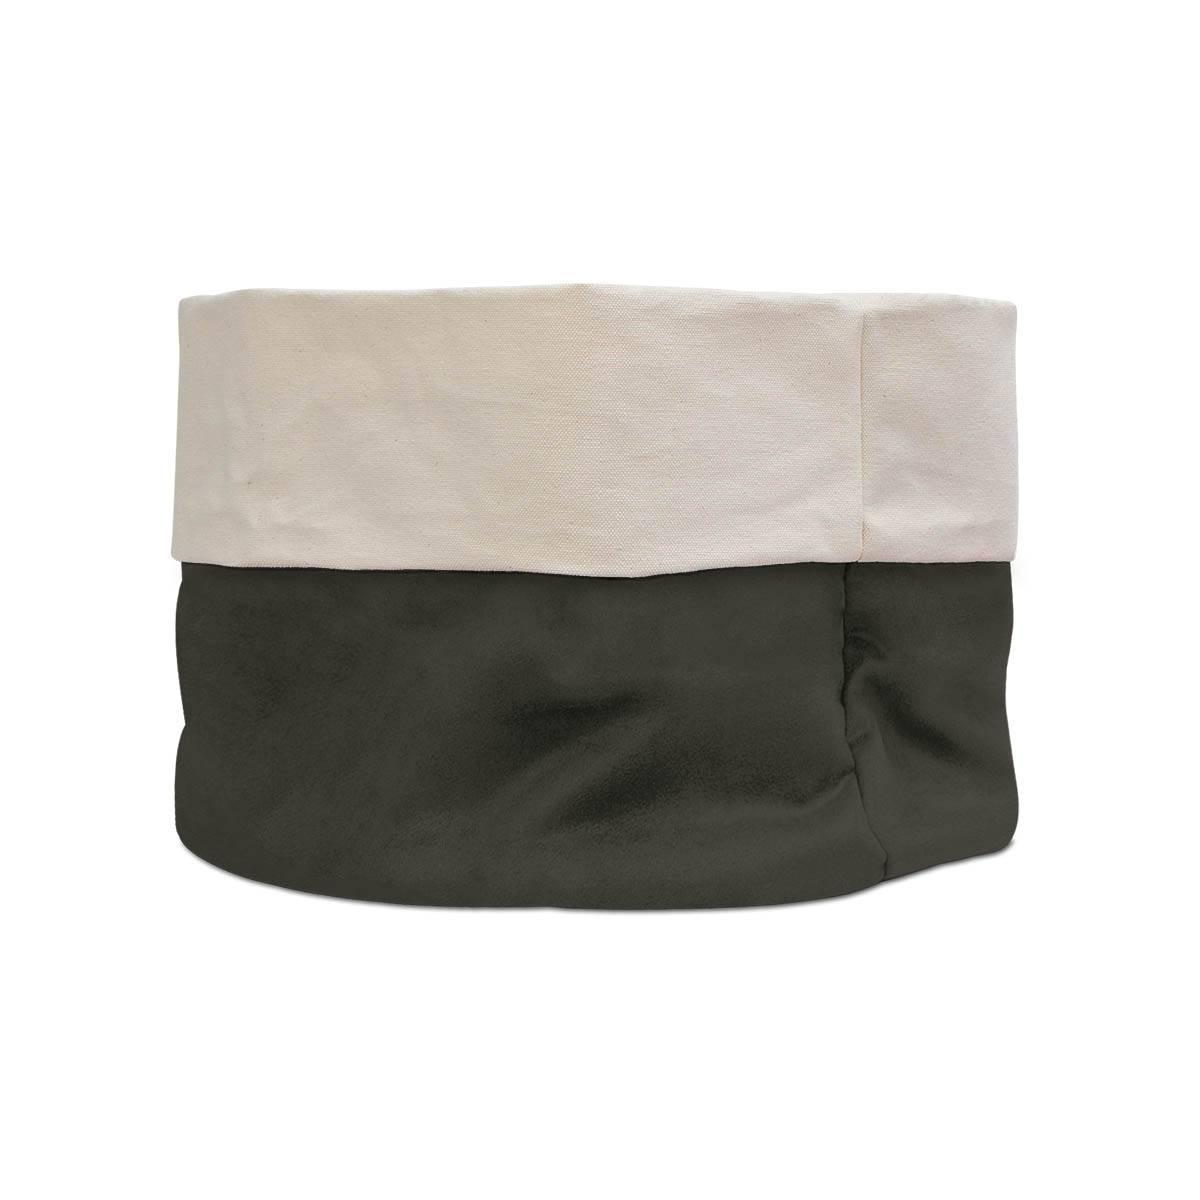 Porta Treco • Futon Company ® #776654 1200x1200 Acessorios Banheiro Moema